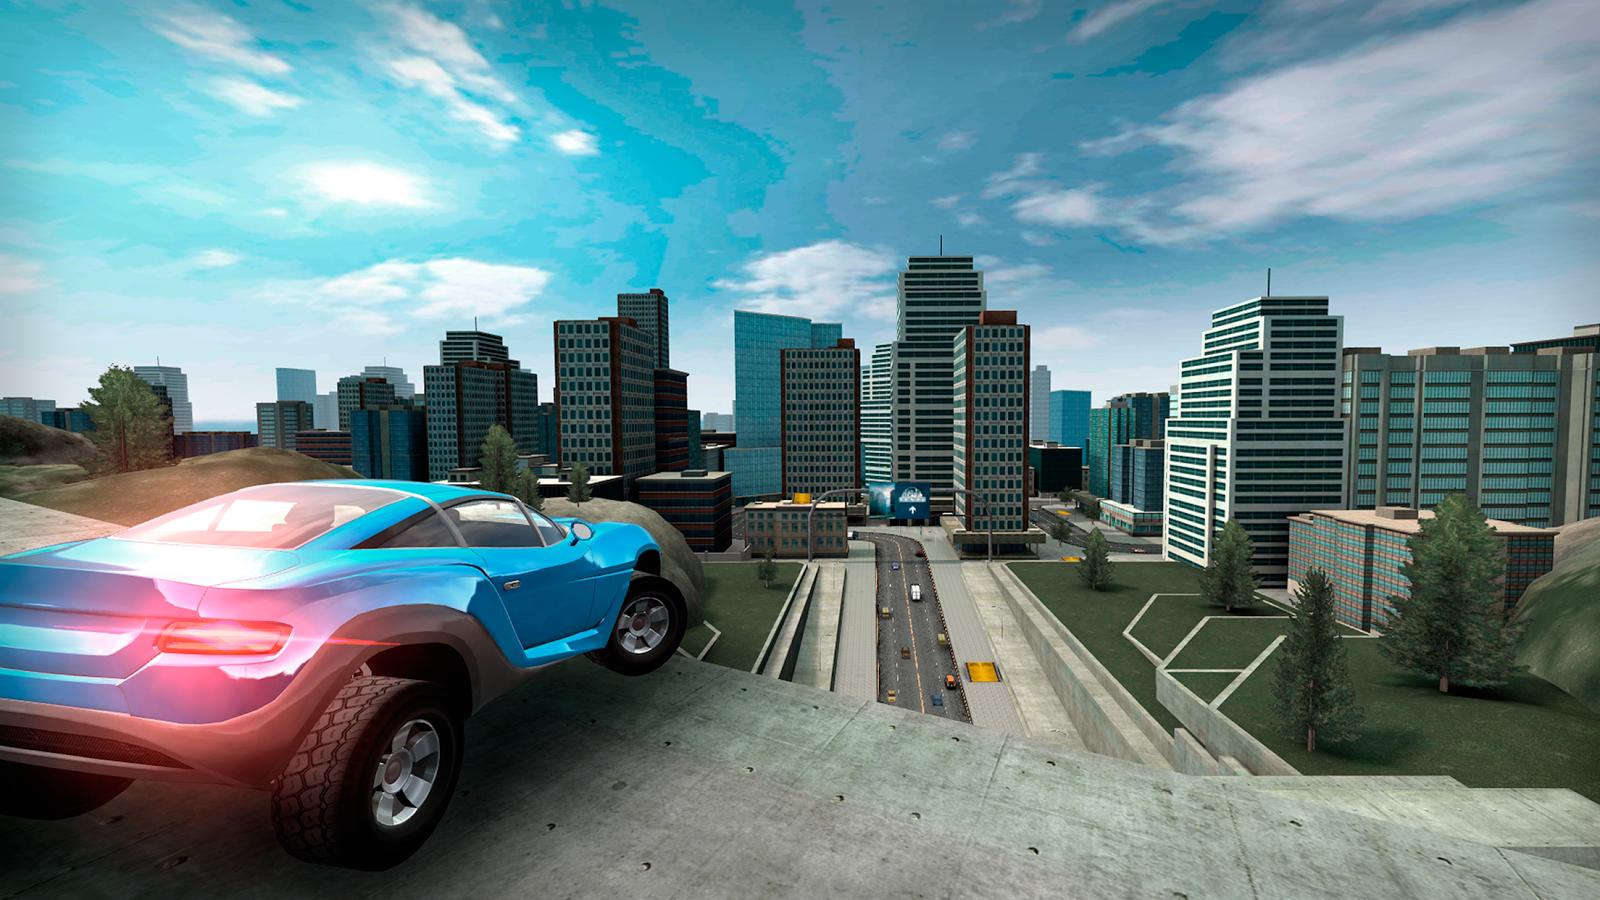 Real Car Driving Experience - Racing game v 1.4.0 apk mod DINHEIRO INFINITO